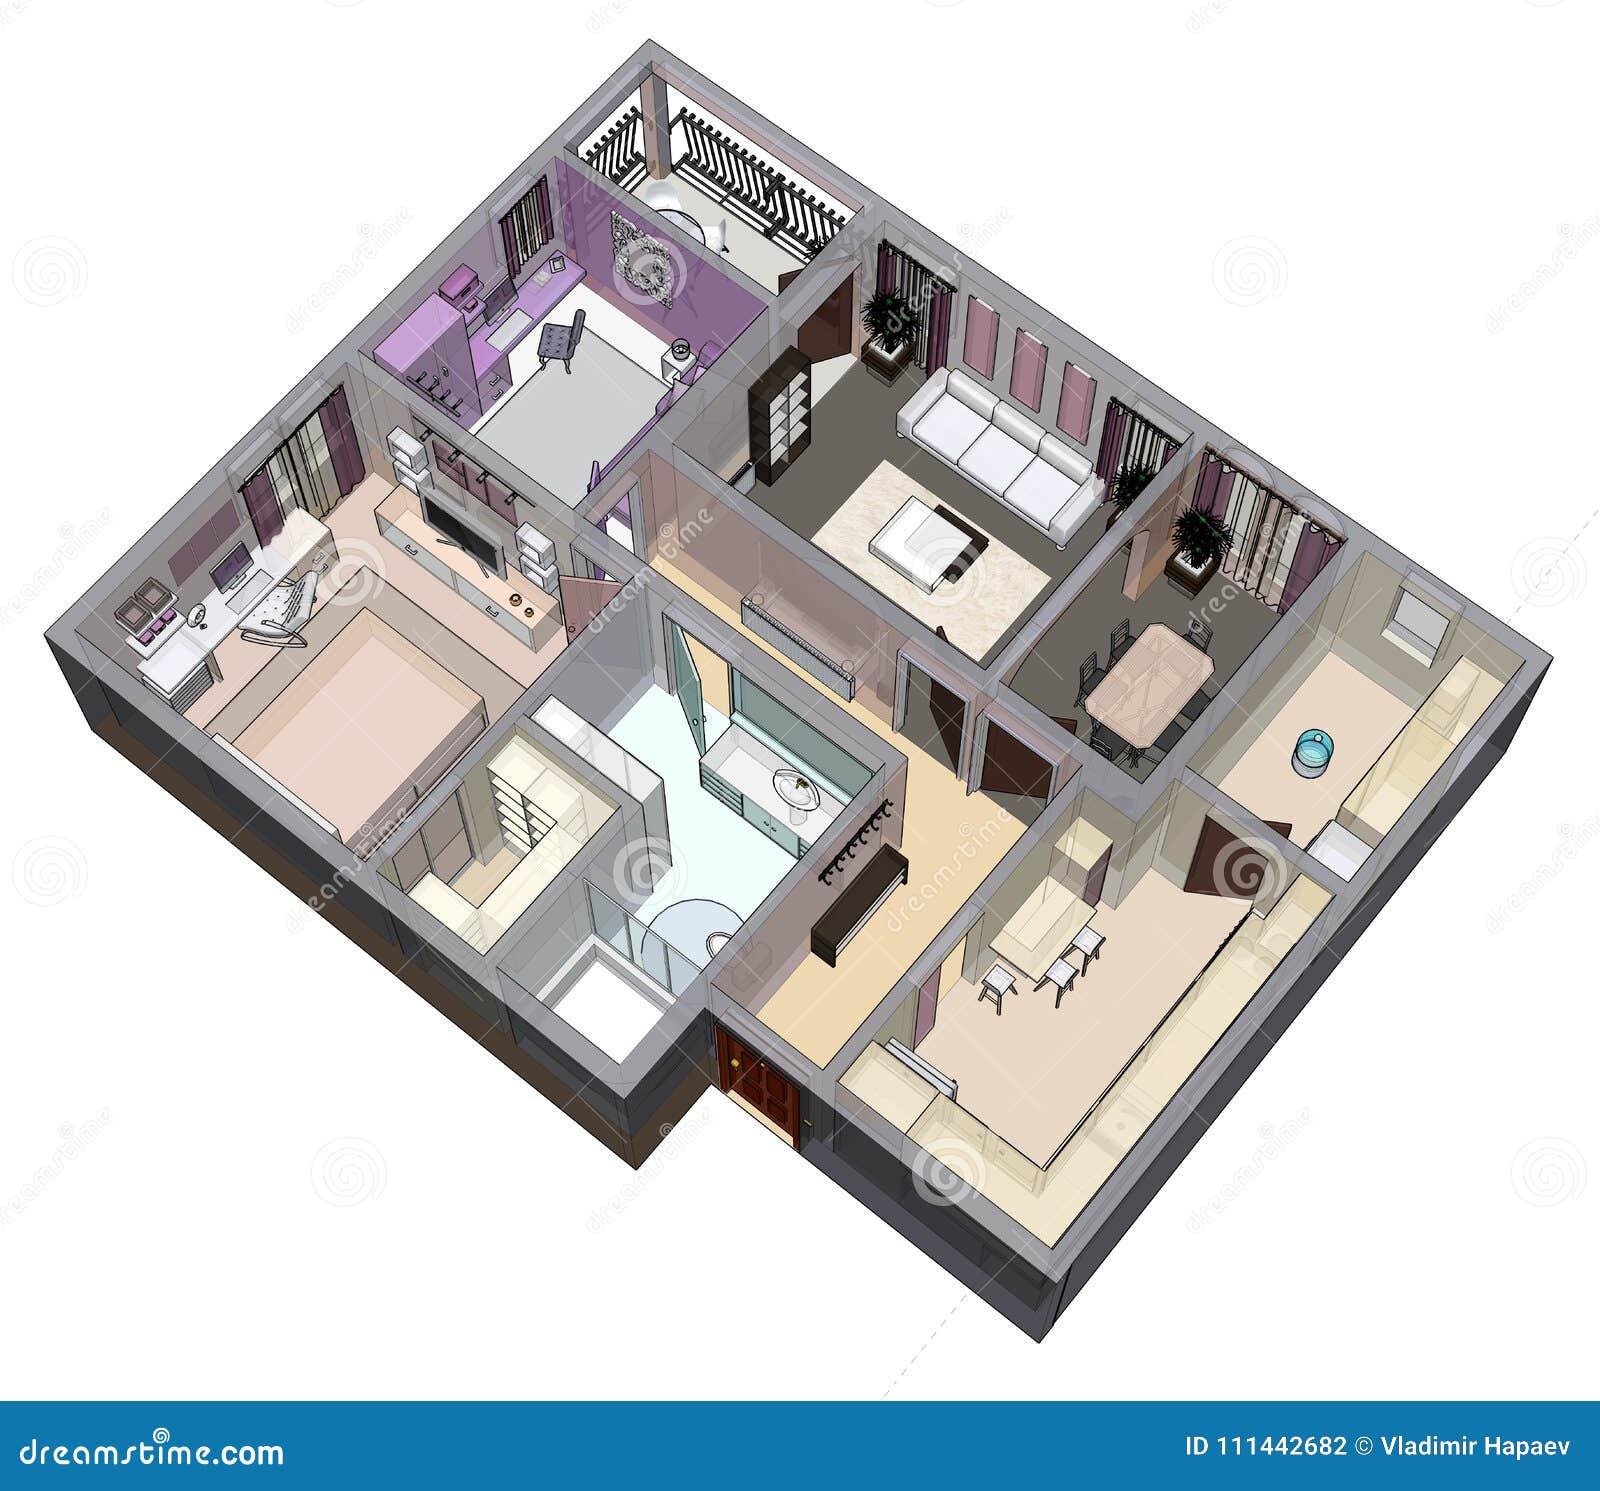 Floor Plan Of The Apartment Or House 3d Renderig Stock Illustration Illustration Of Bathroom Furniture 111442682